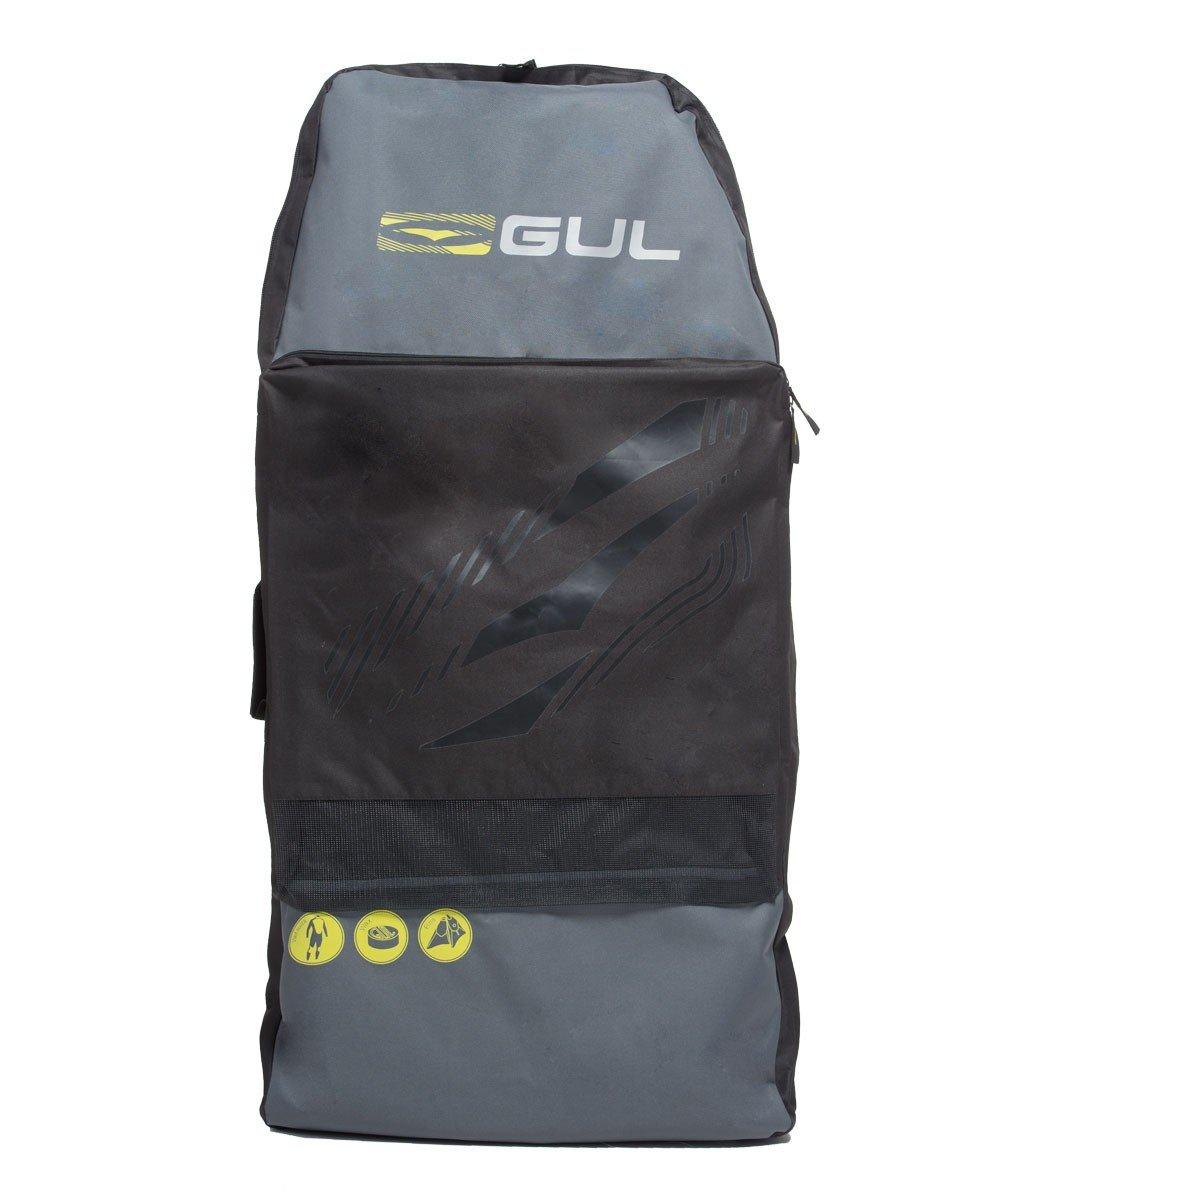 Gul Arica Bodyboard Bag Back Pack for 2 x 42'' Adult Bodyboards. Black / Yellow